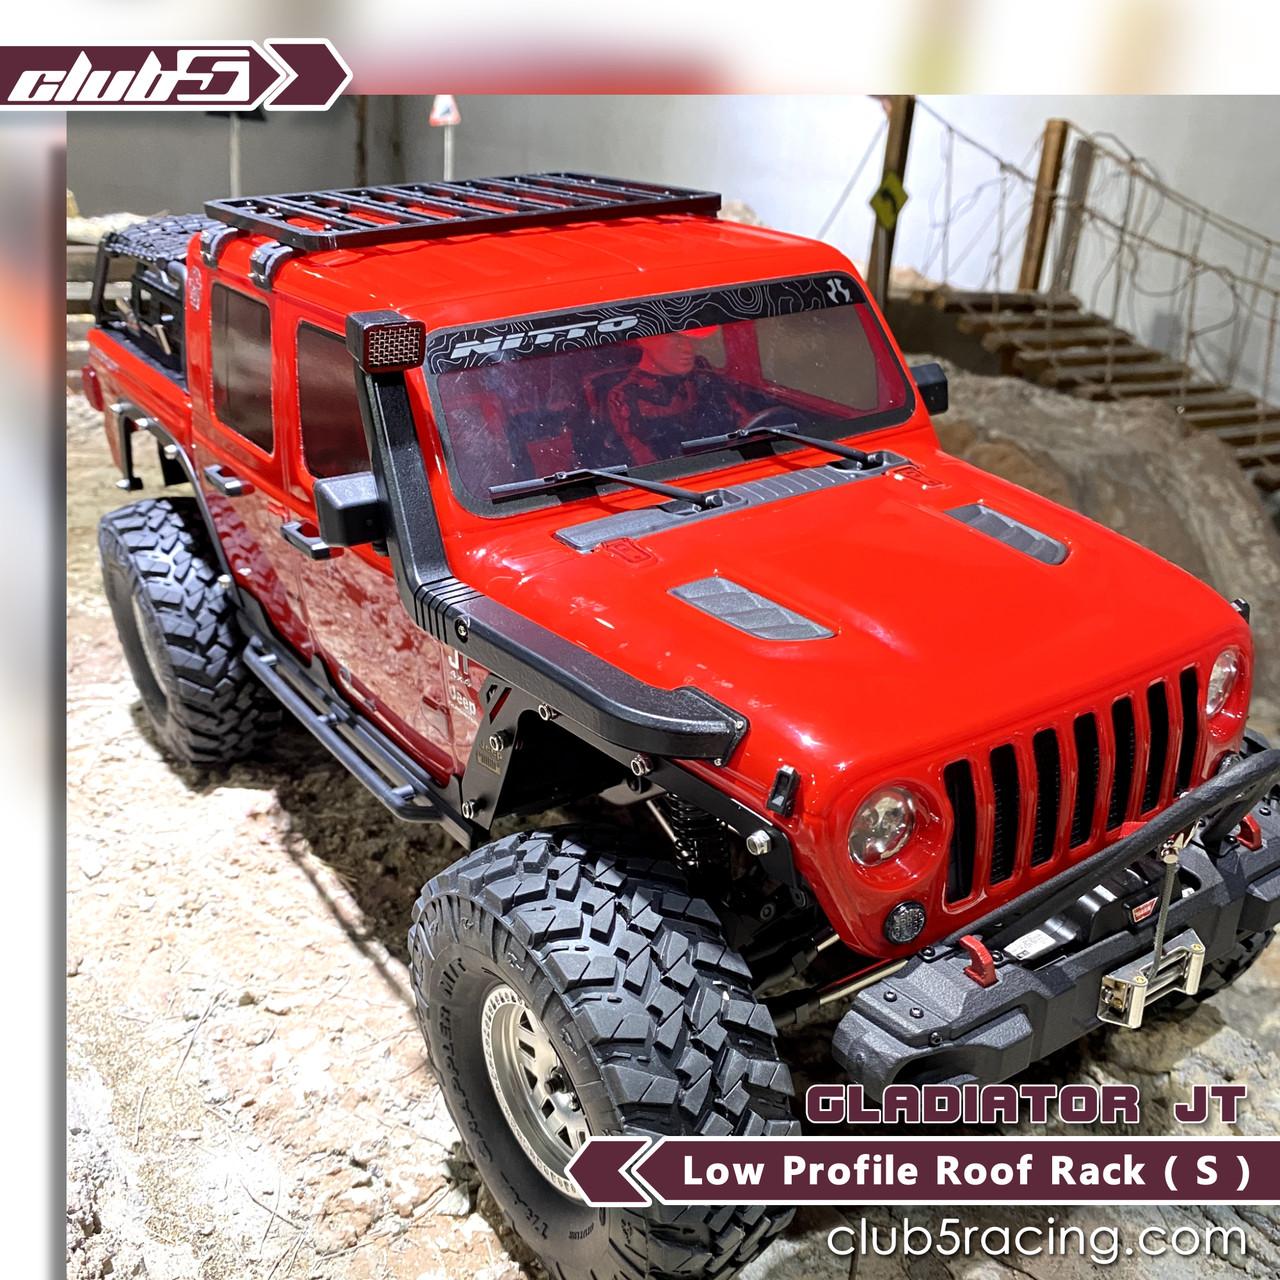 Low Profile Roof Rack for SCX10 III Jeep JL Wrangler / JT Gladiator ( 3DP )